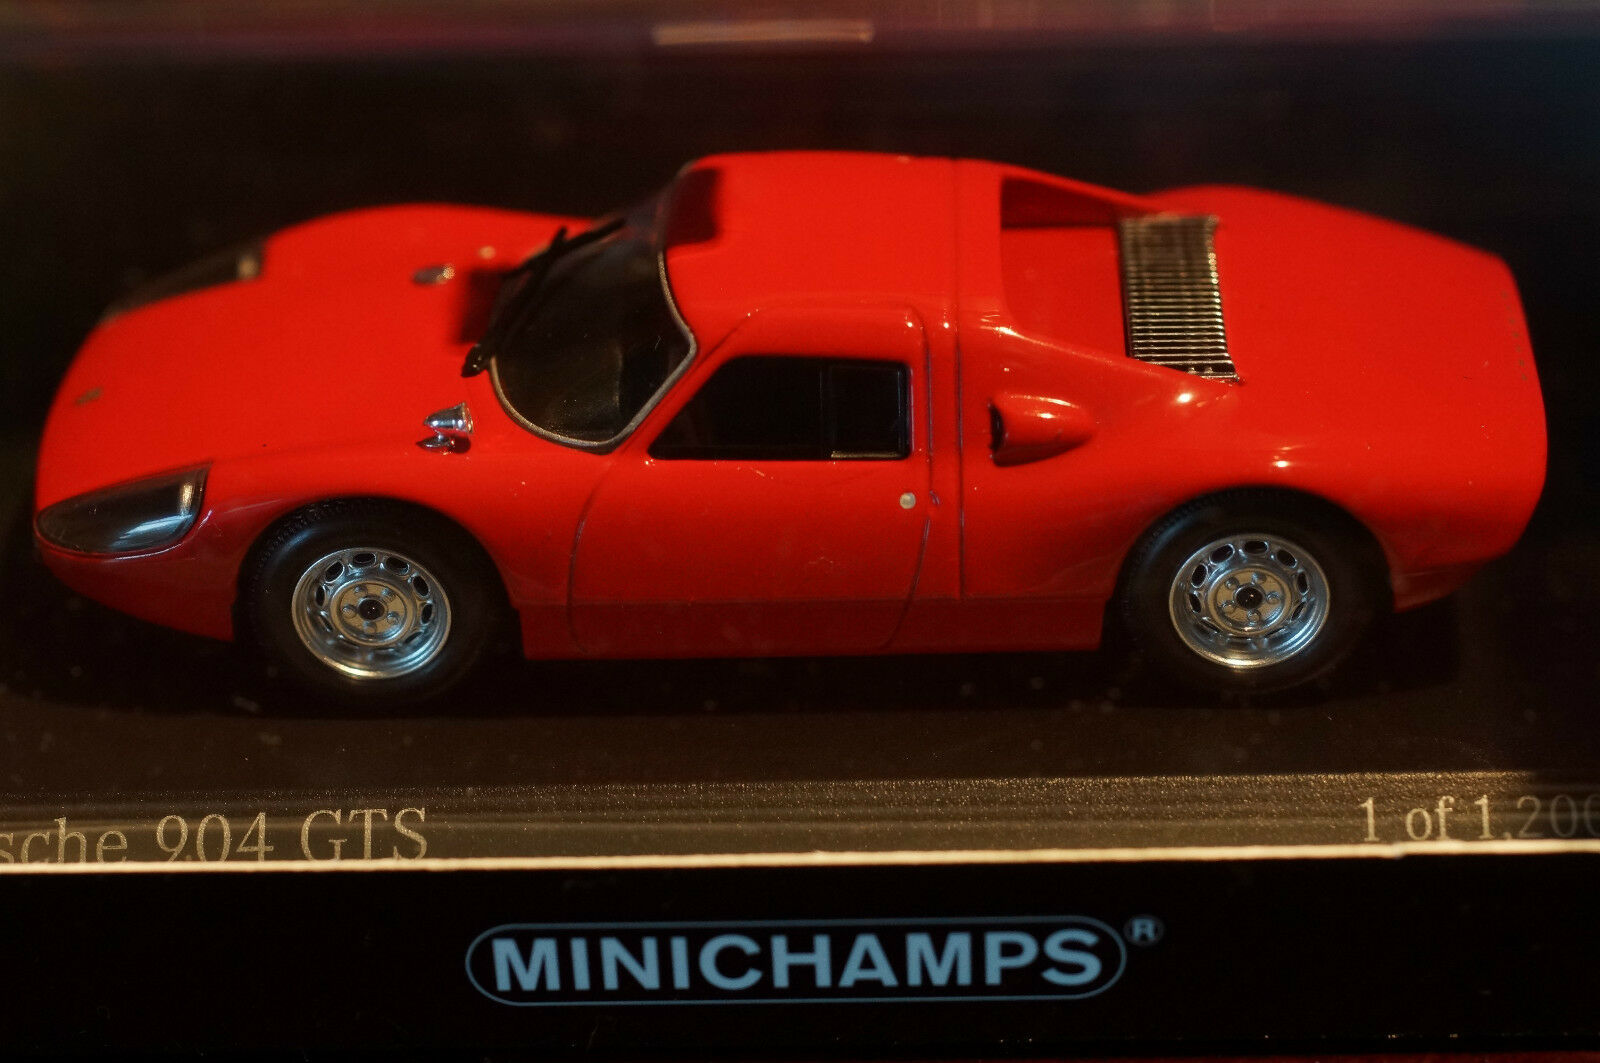 Rare Minichamps Porsche 1 43 Scale 904GTS Red MINT Boxed Ltd Collectors Edition